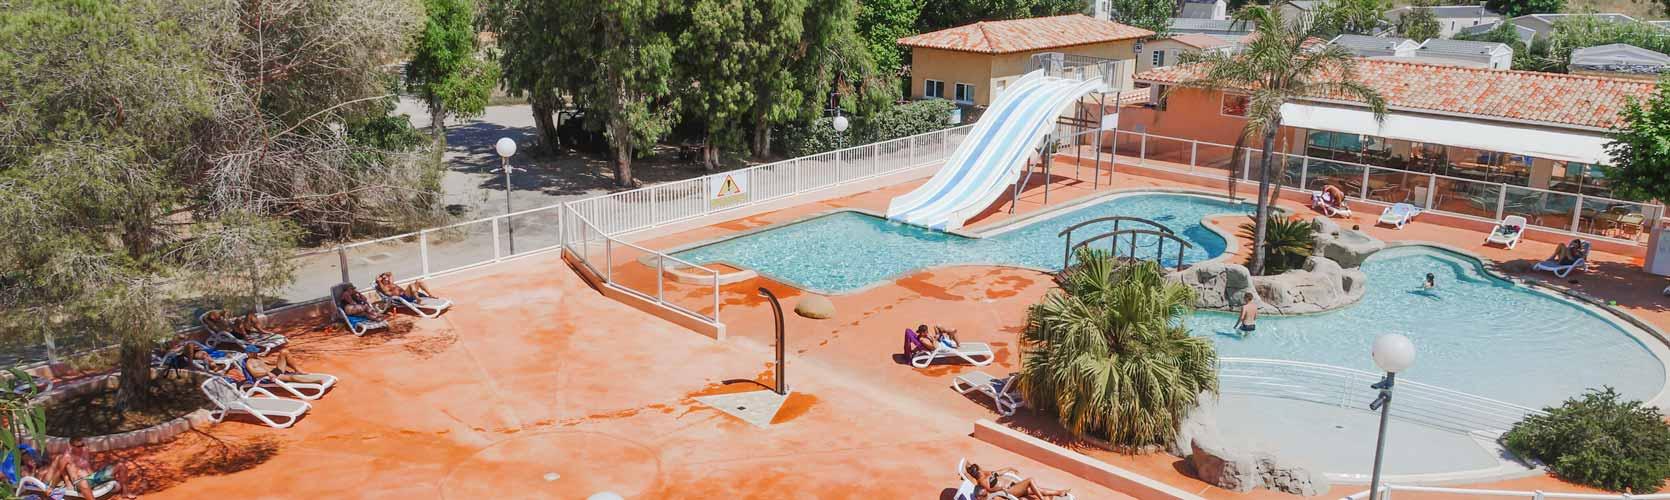 Corsica Campsite With Swimming Pool   Calvi Campsite With ... concernant Camping Var Avec Piscine